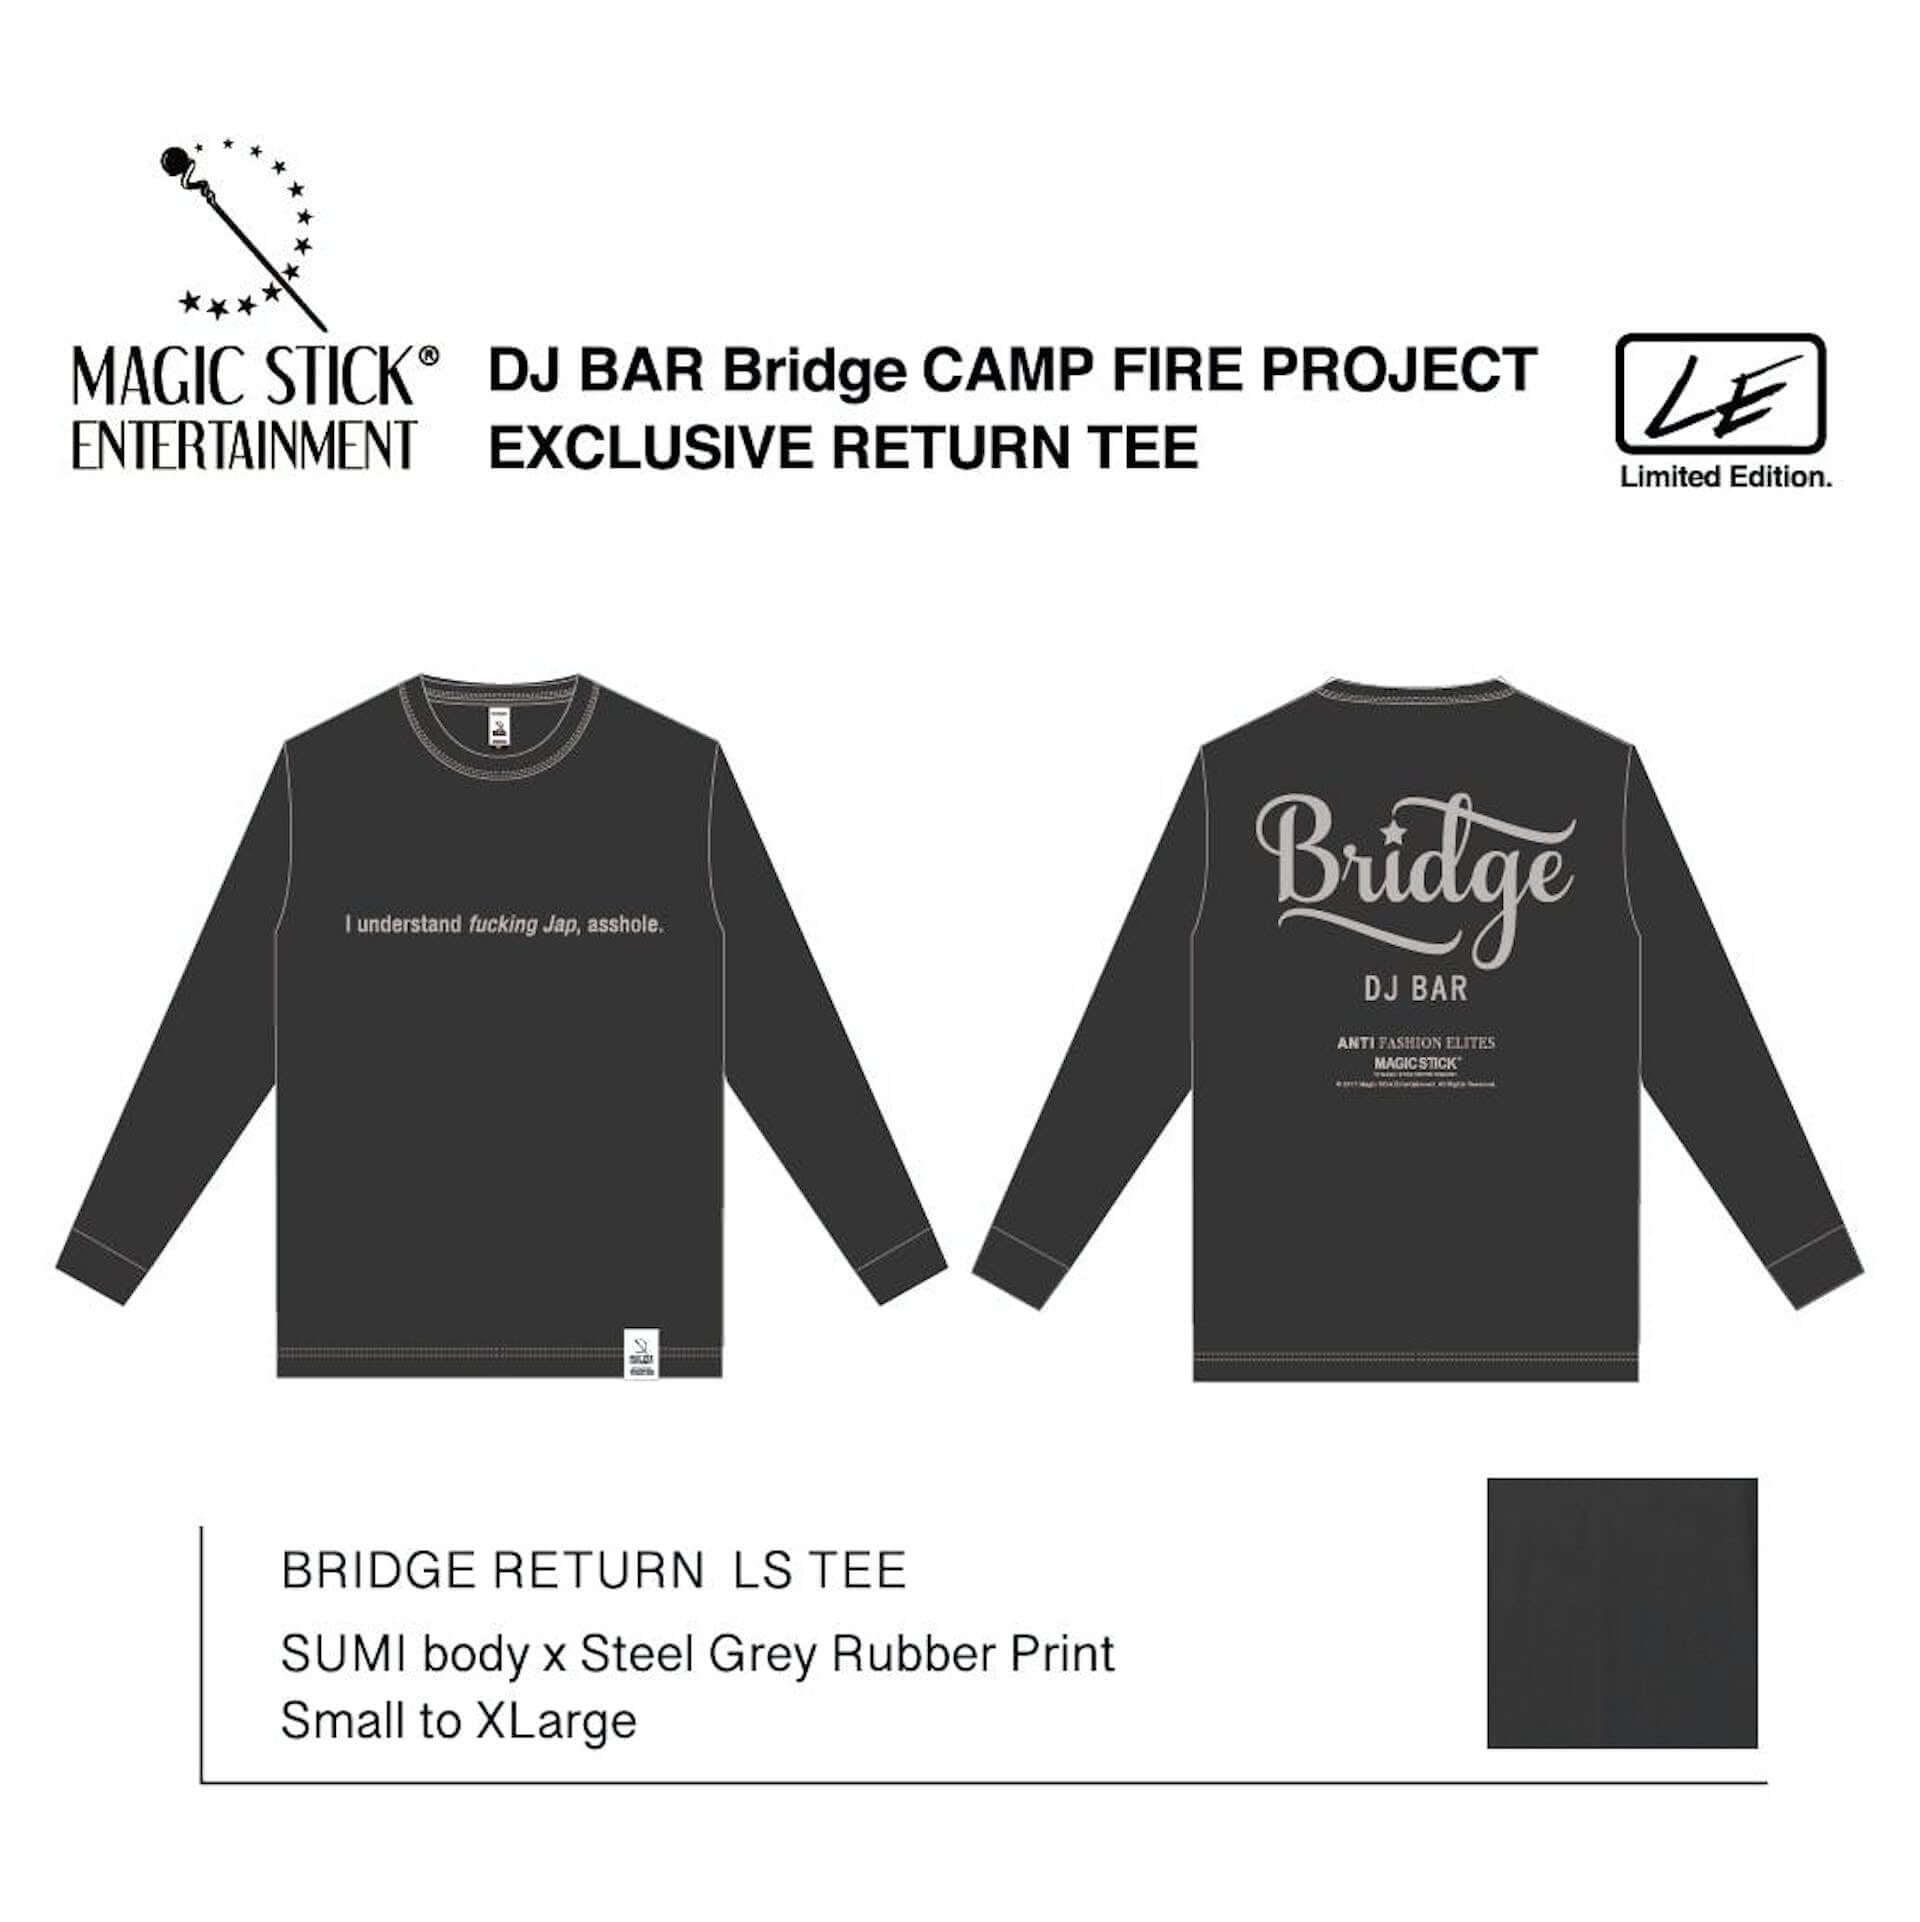 DJ BAR Bridgeが、店舗存続のための緊急支援をクラウドファンディングで募集中!リターンには非売品Tシャツも music200525_bridge_fire_04-1920x1922